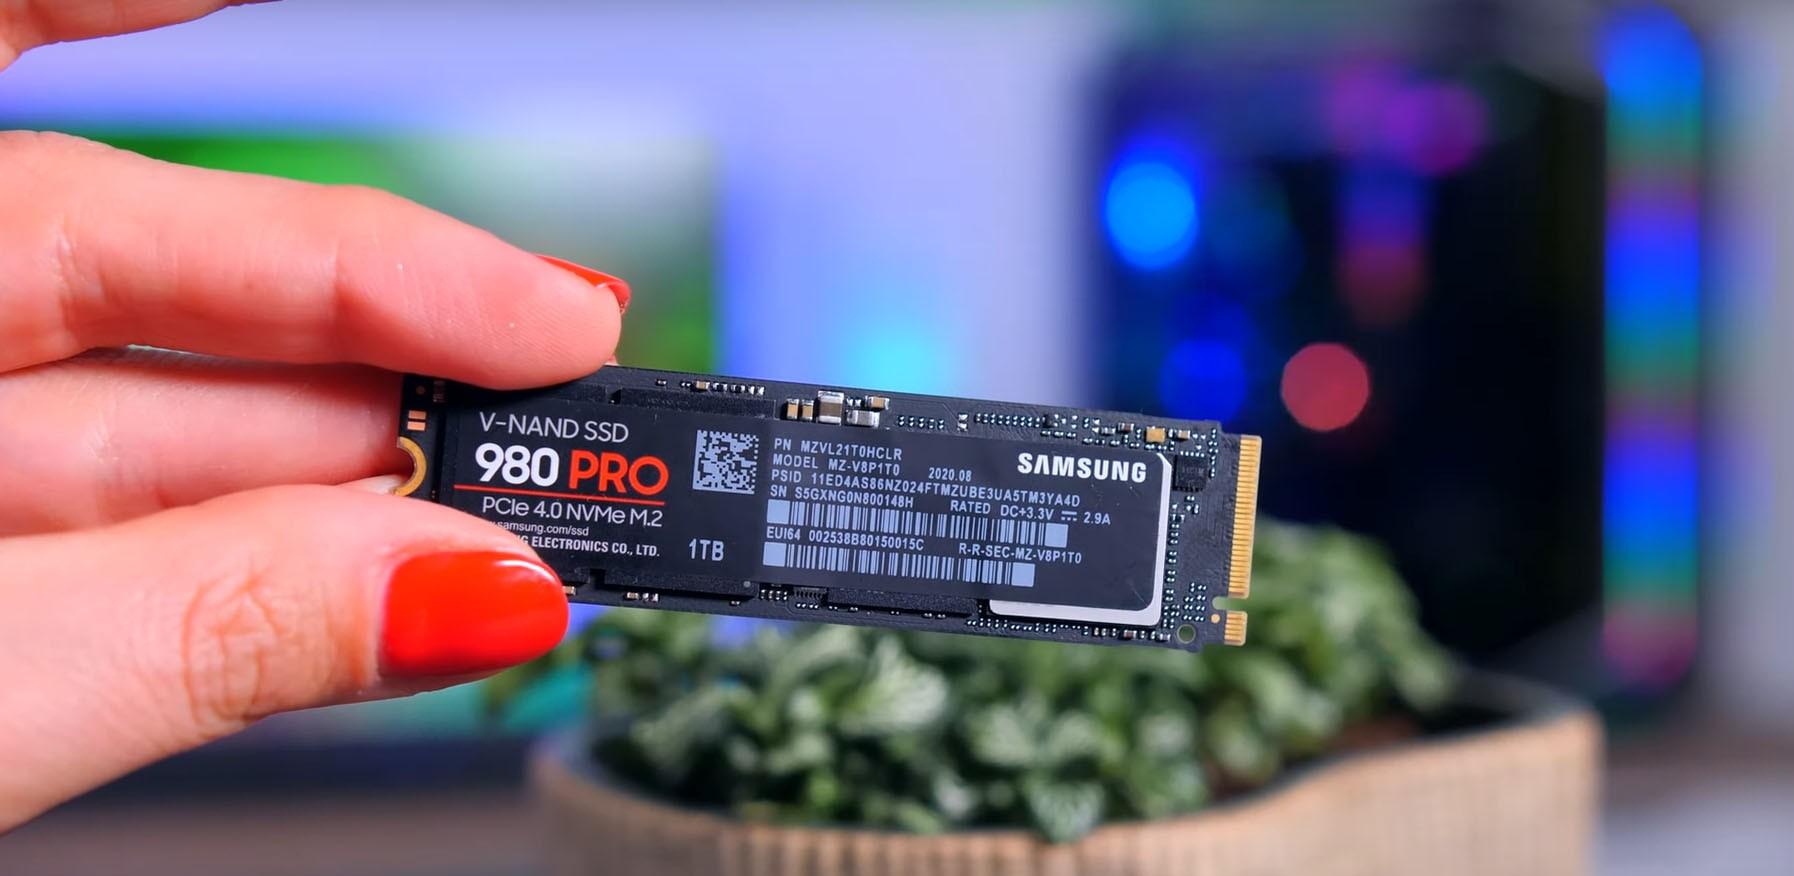 Ổ cứng SSD Samsung 980 PRO 1TB PCIe 4.0 M.2 NVMe